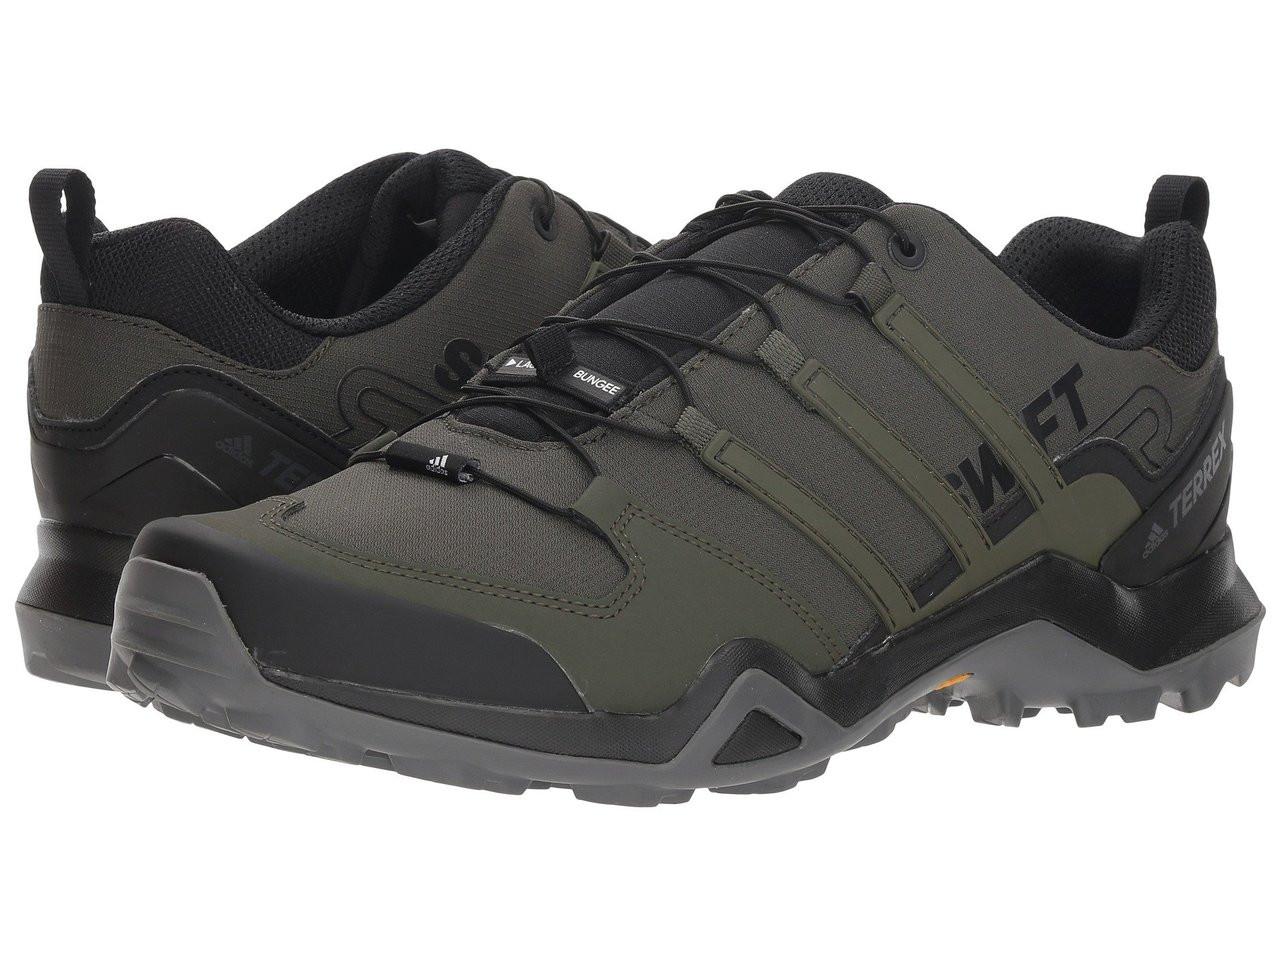 cc53e0611b3 Adidas AC7983 Men s Terrex Swift R2 Night Cargo   Base Green Shoes ...